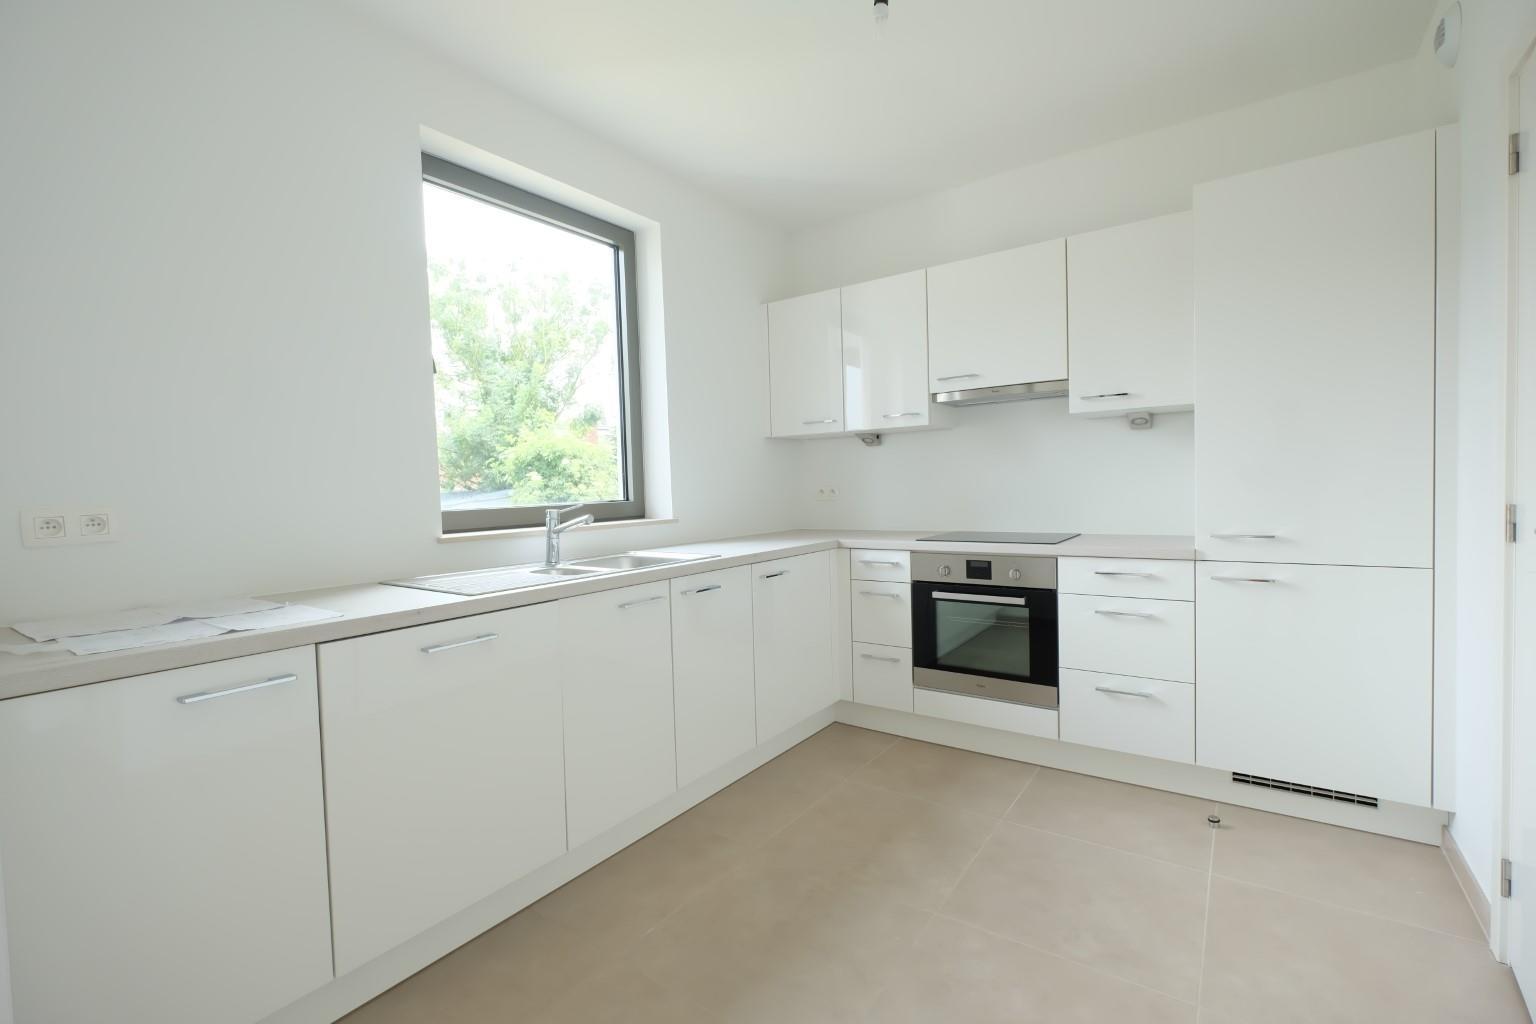 Appartement - Soignies - #3015957-12